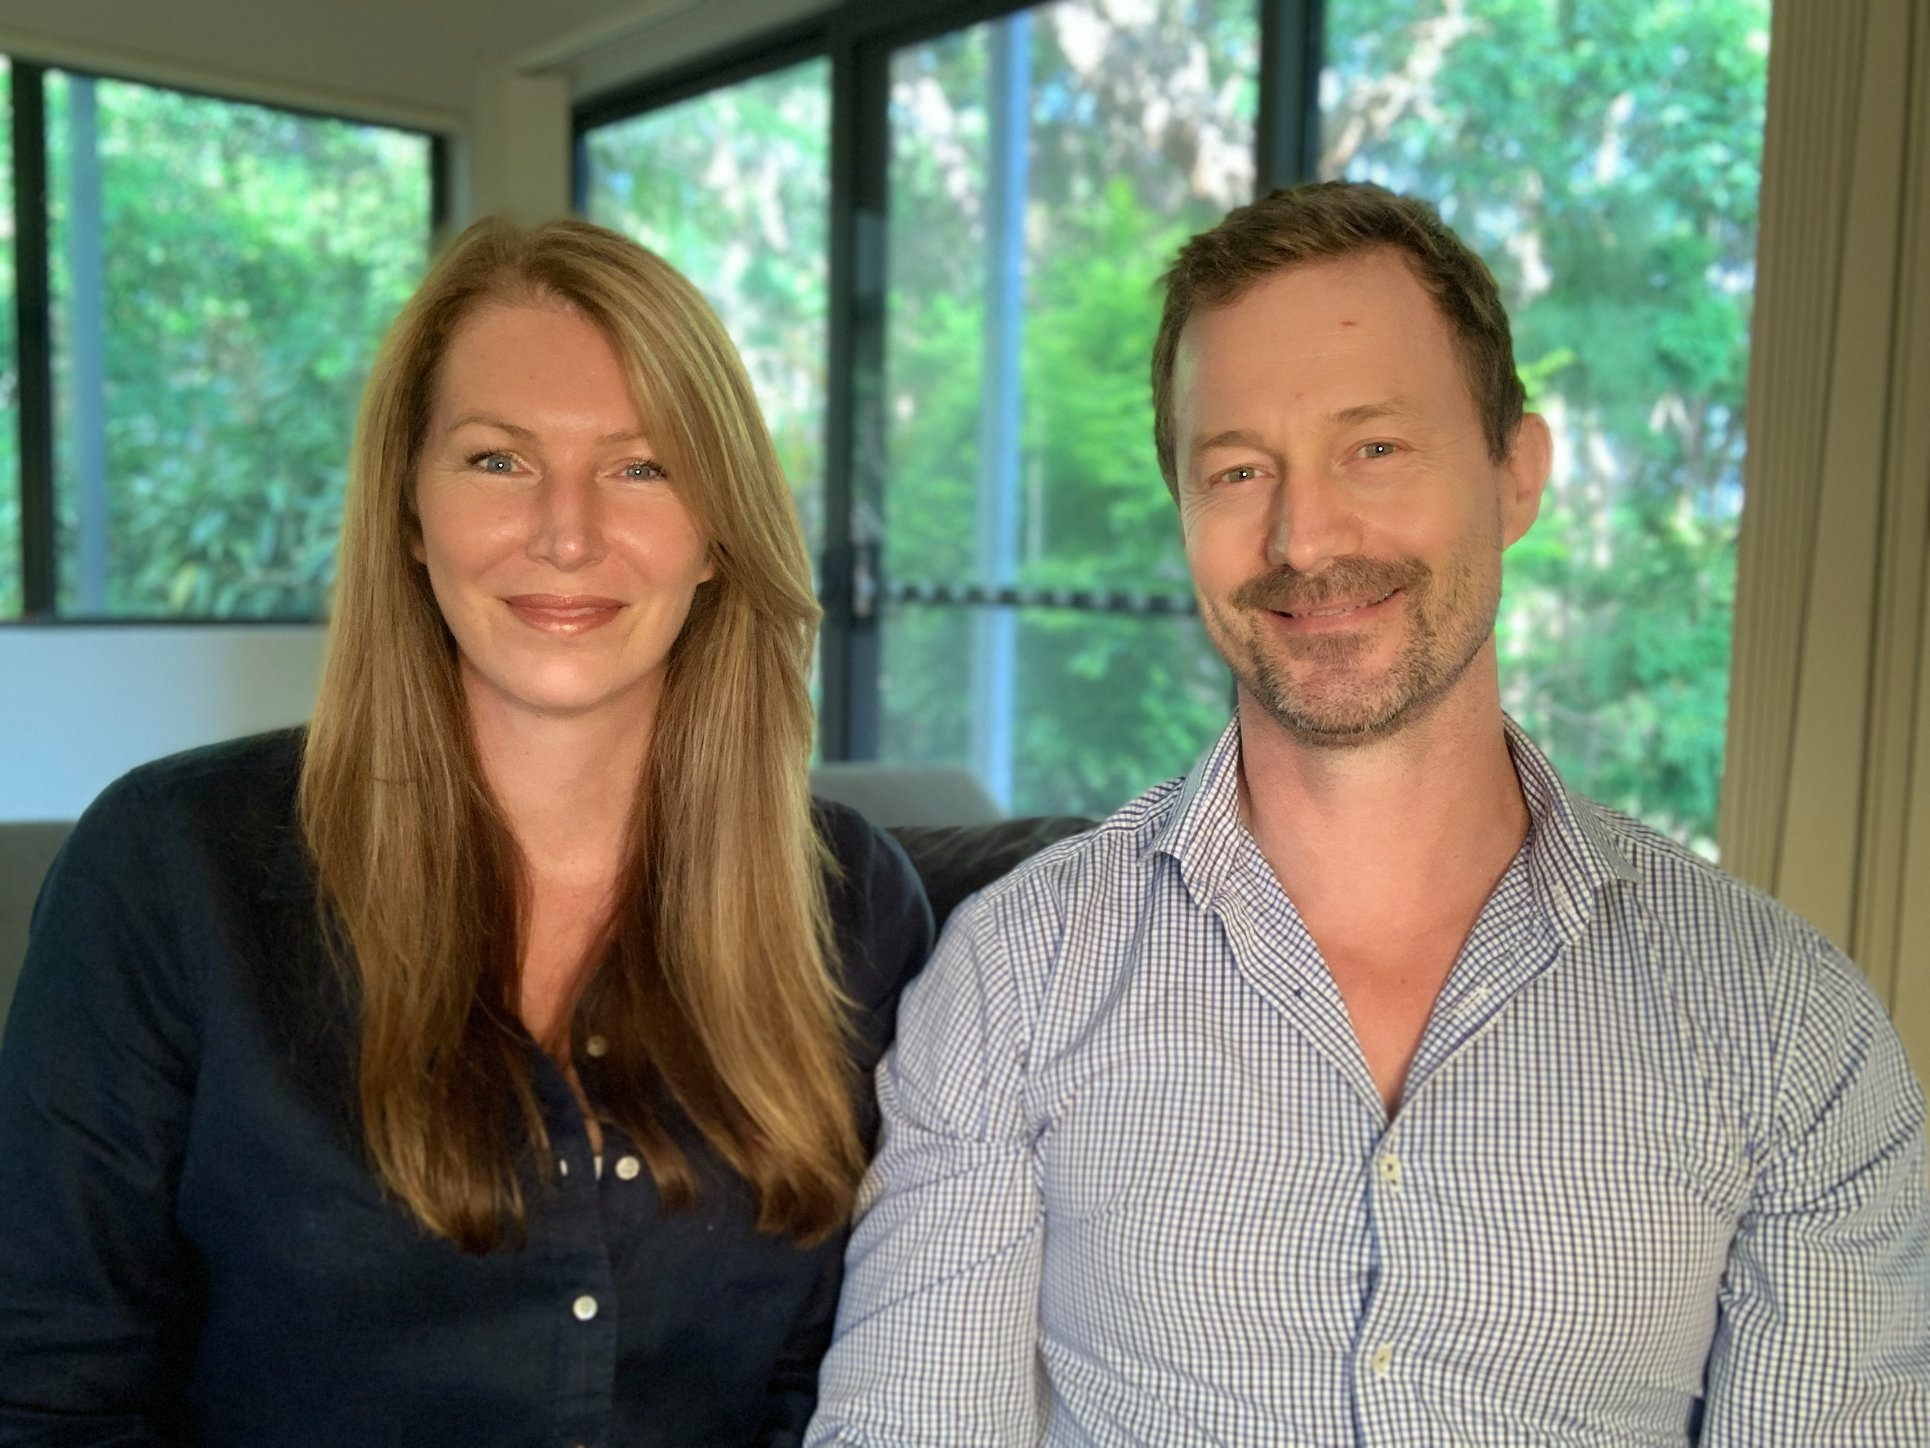 James Hannan and Naomi Joy Rise Social Media